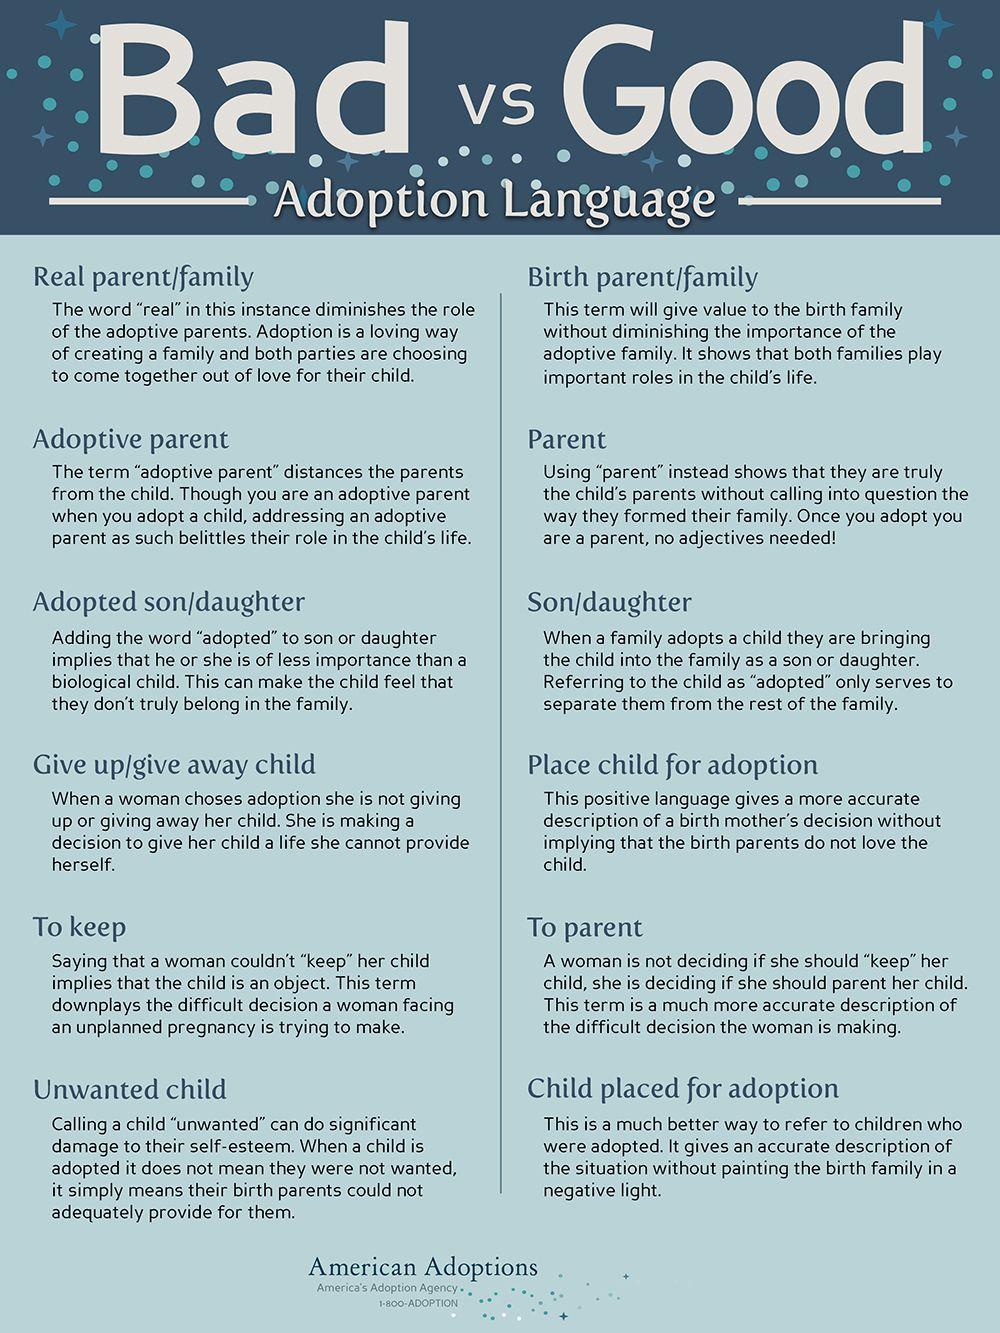 Adoption Language Infographic Adoption quotes, Adopting